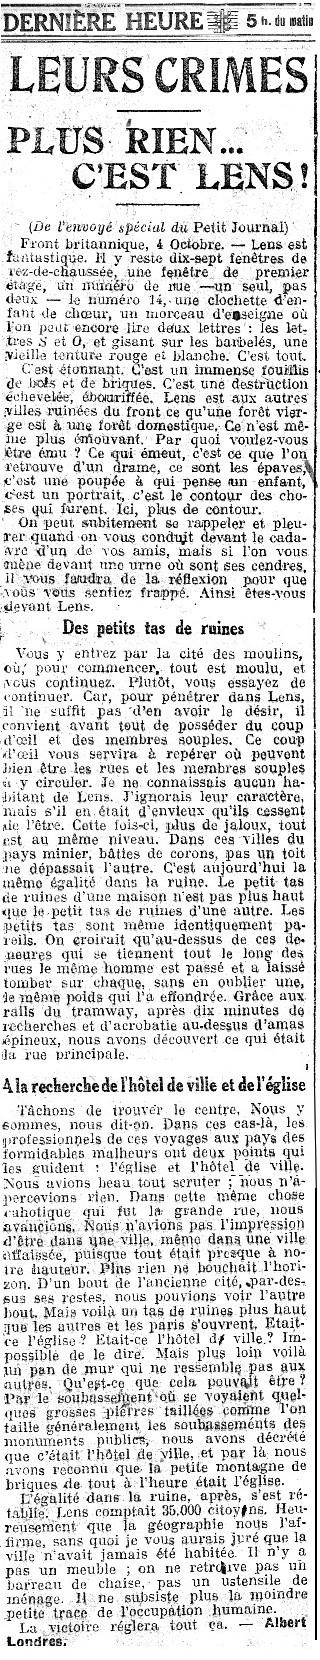 1lens 04 10 1918 londres